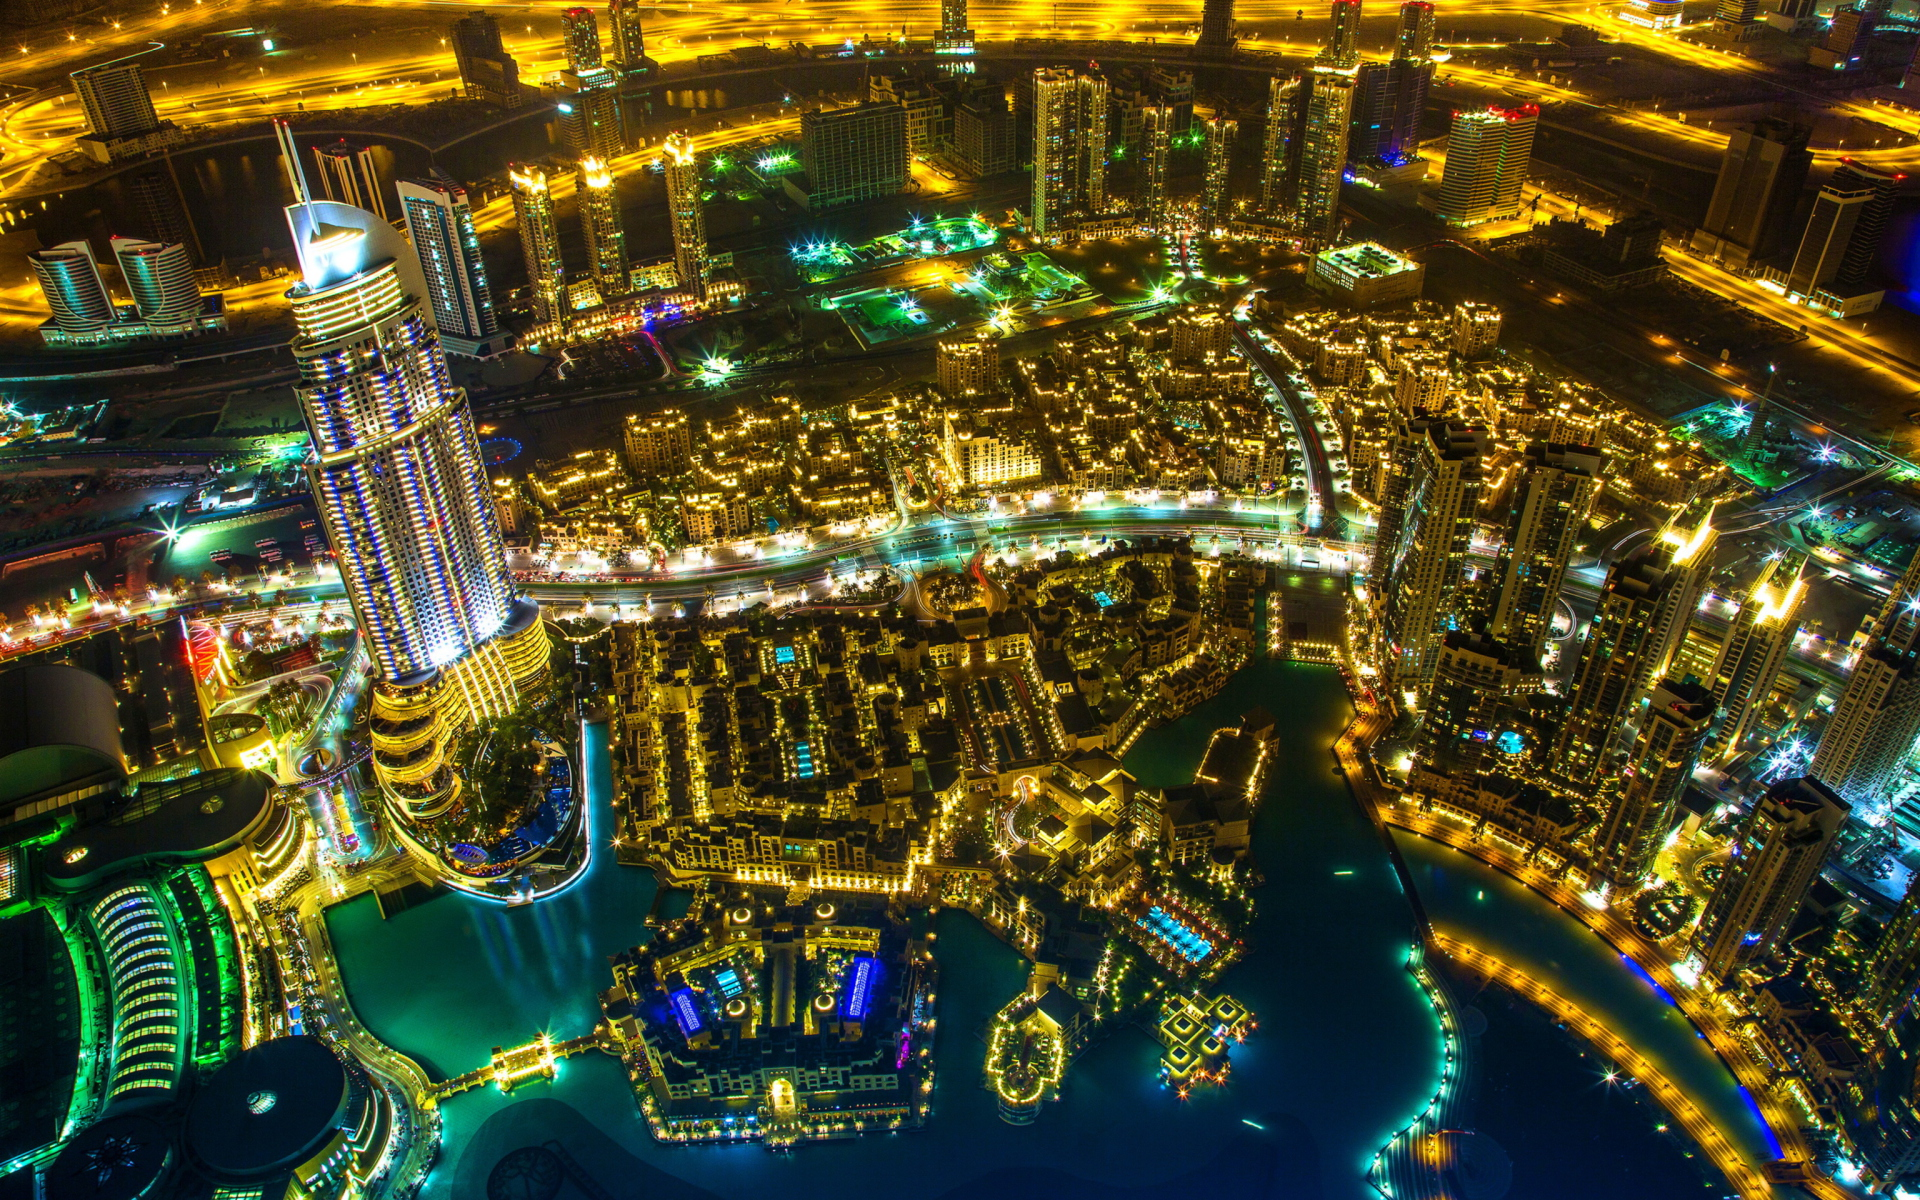 Dubai Top View para Widescreen Desktop PC 1920x1080 Full HD